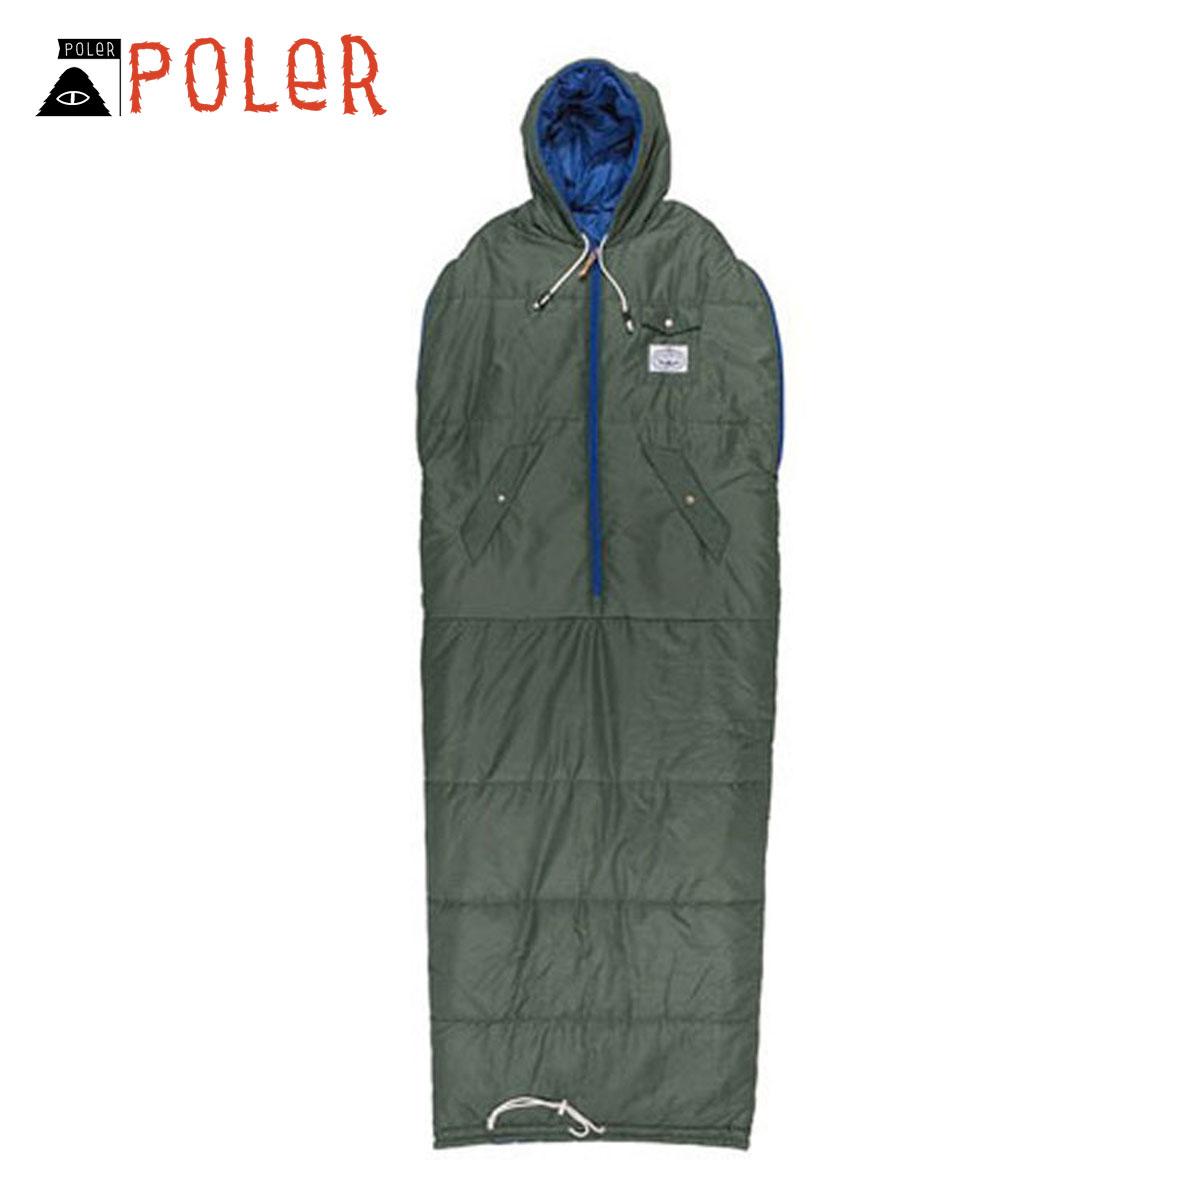 Polar Poler Regular Sleeping Bag Reversible Napsack 634021 Lfg Leaf Green